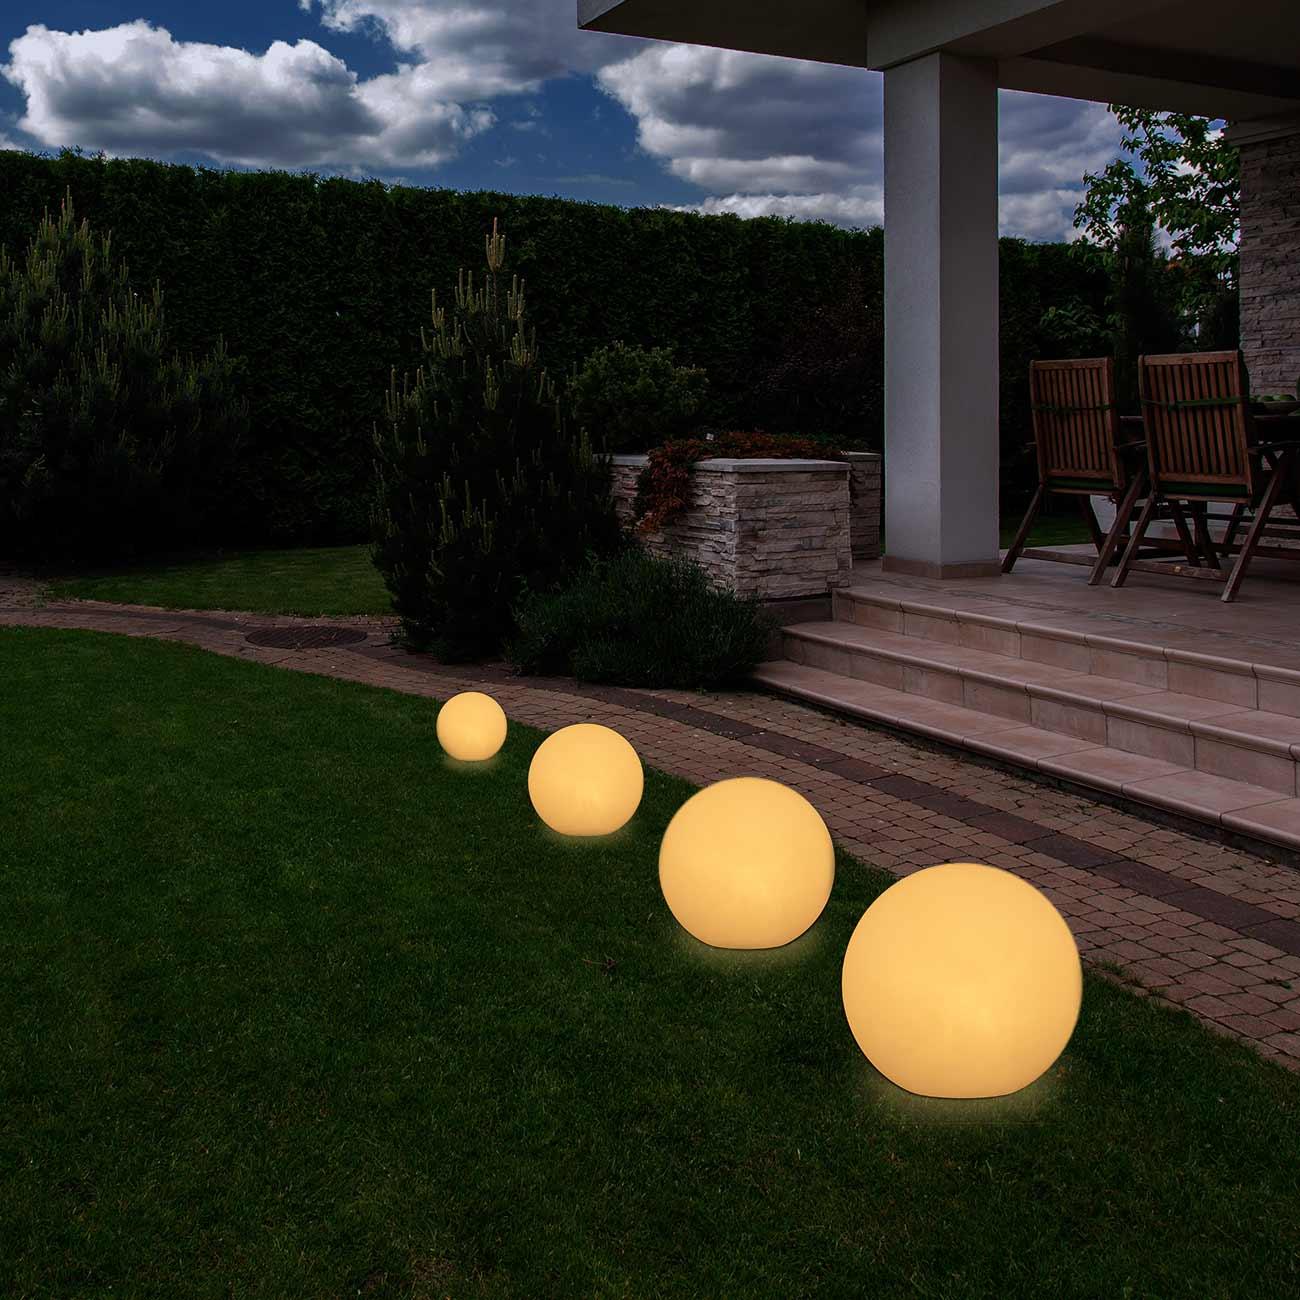 lampe de jardin boule d corative ronde lumineuse ext rieur. Black Bedroom Furniture Sets. Home Design Ideas